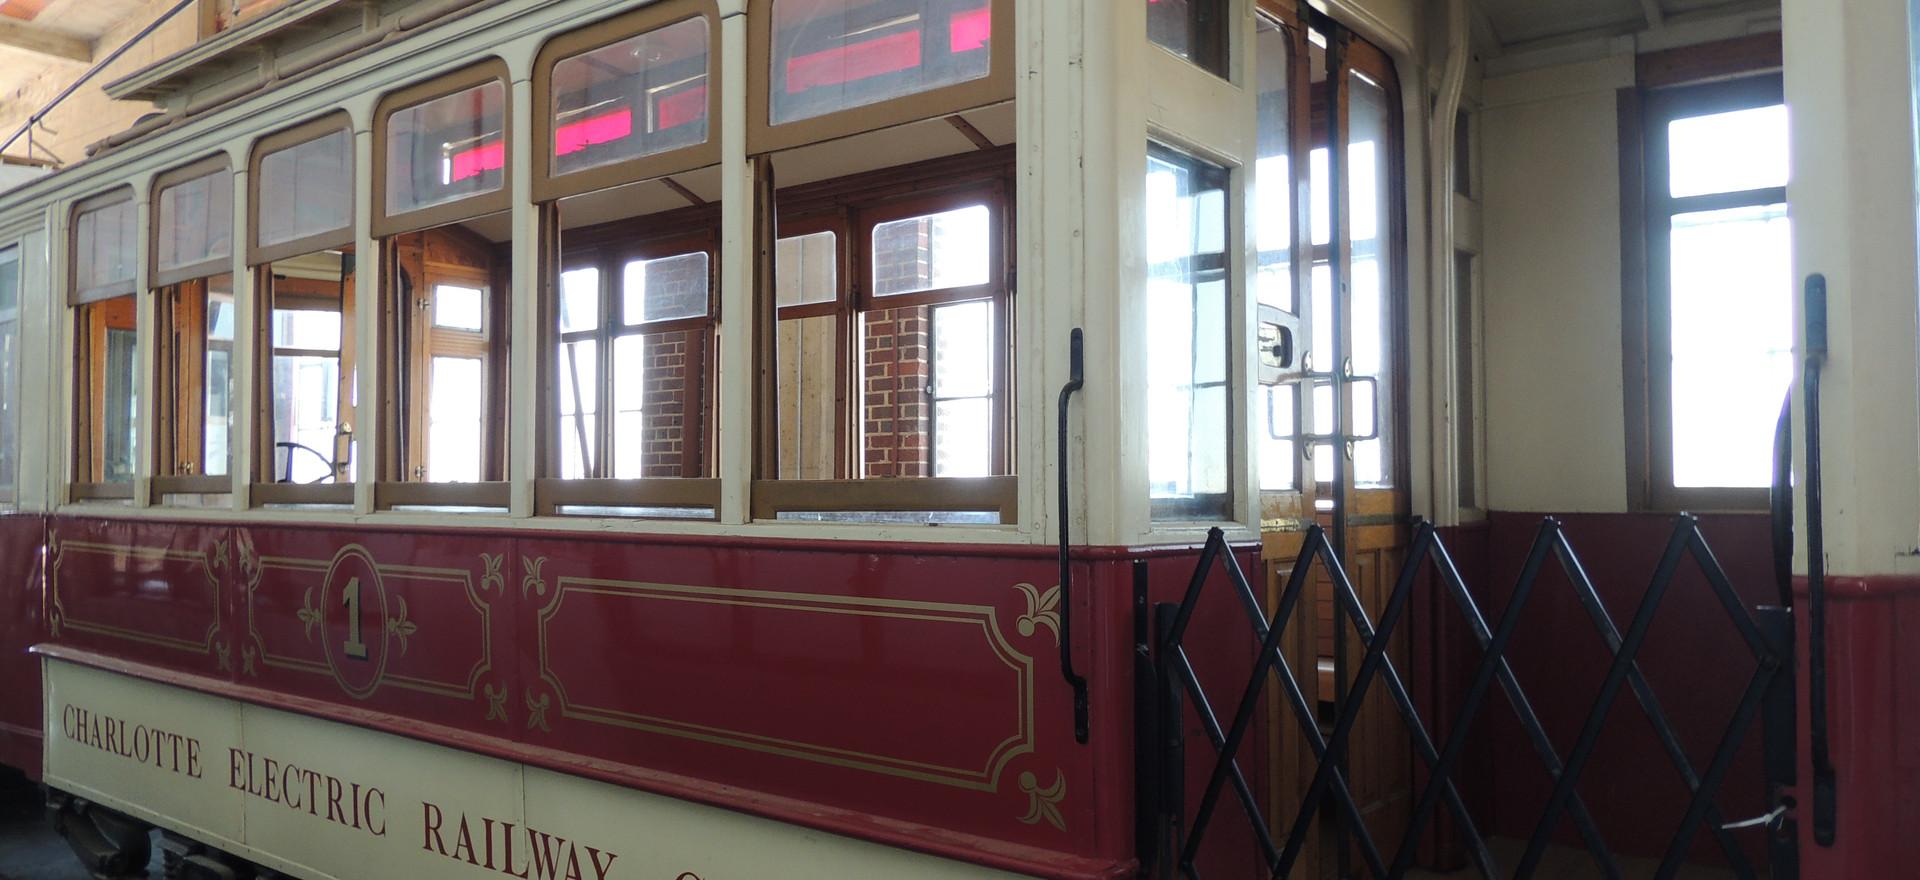 Charlotte Electric Railway #1